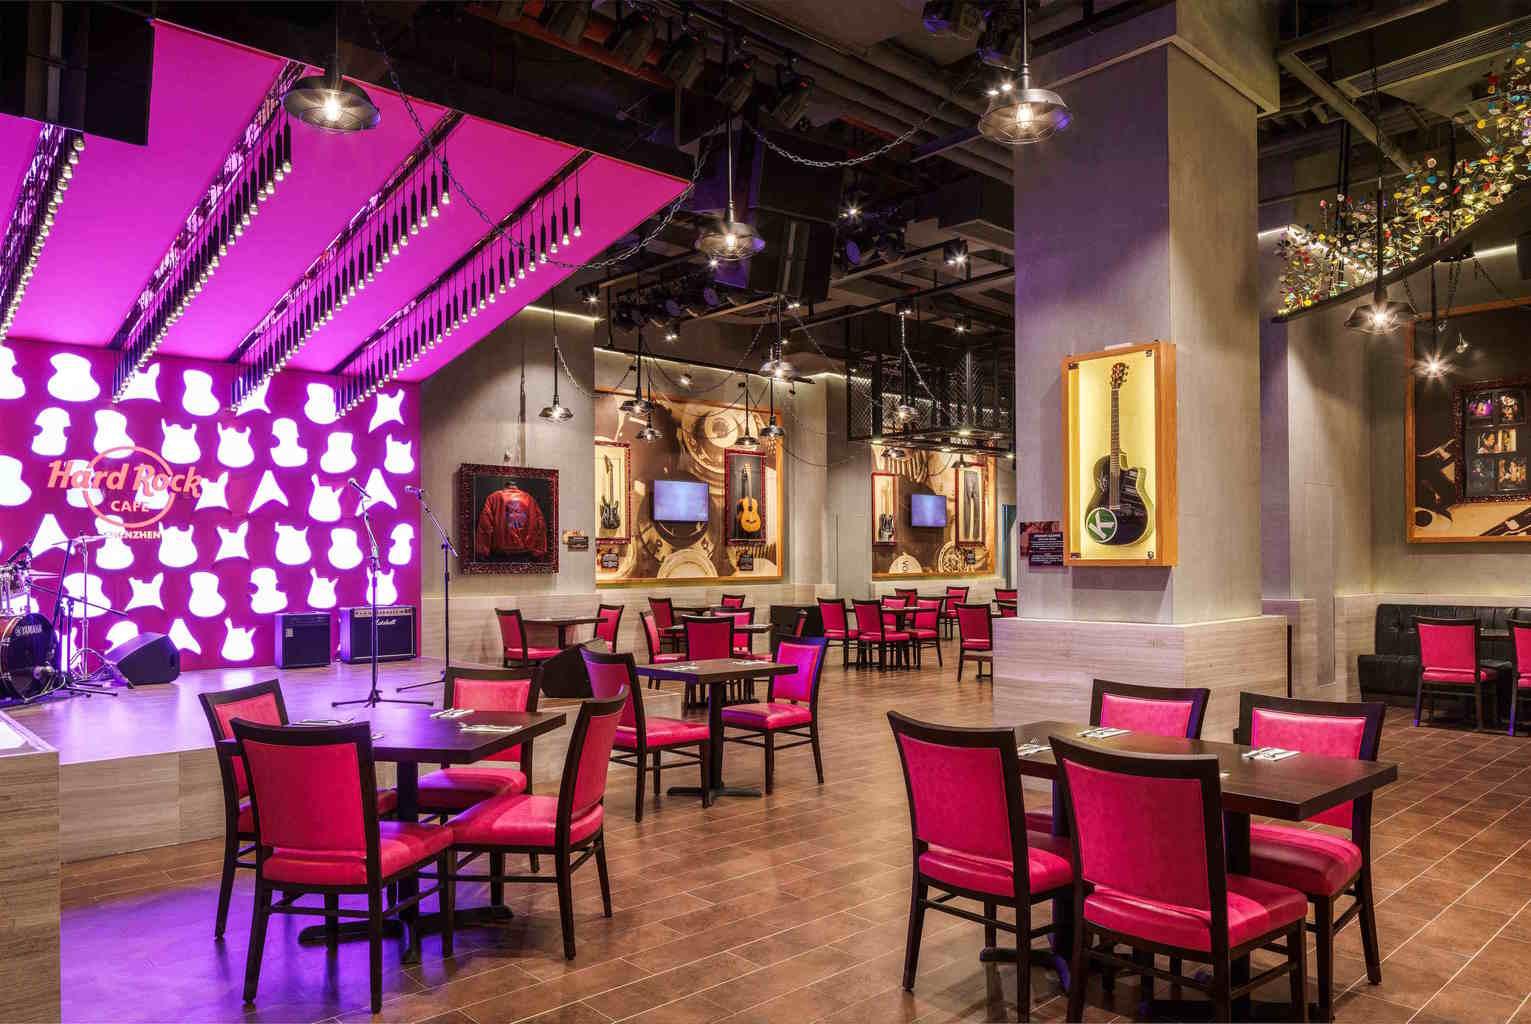 Hard Rock Cafe Shenzhen 深圳硬石餐厅 3.jpg